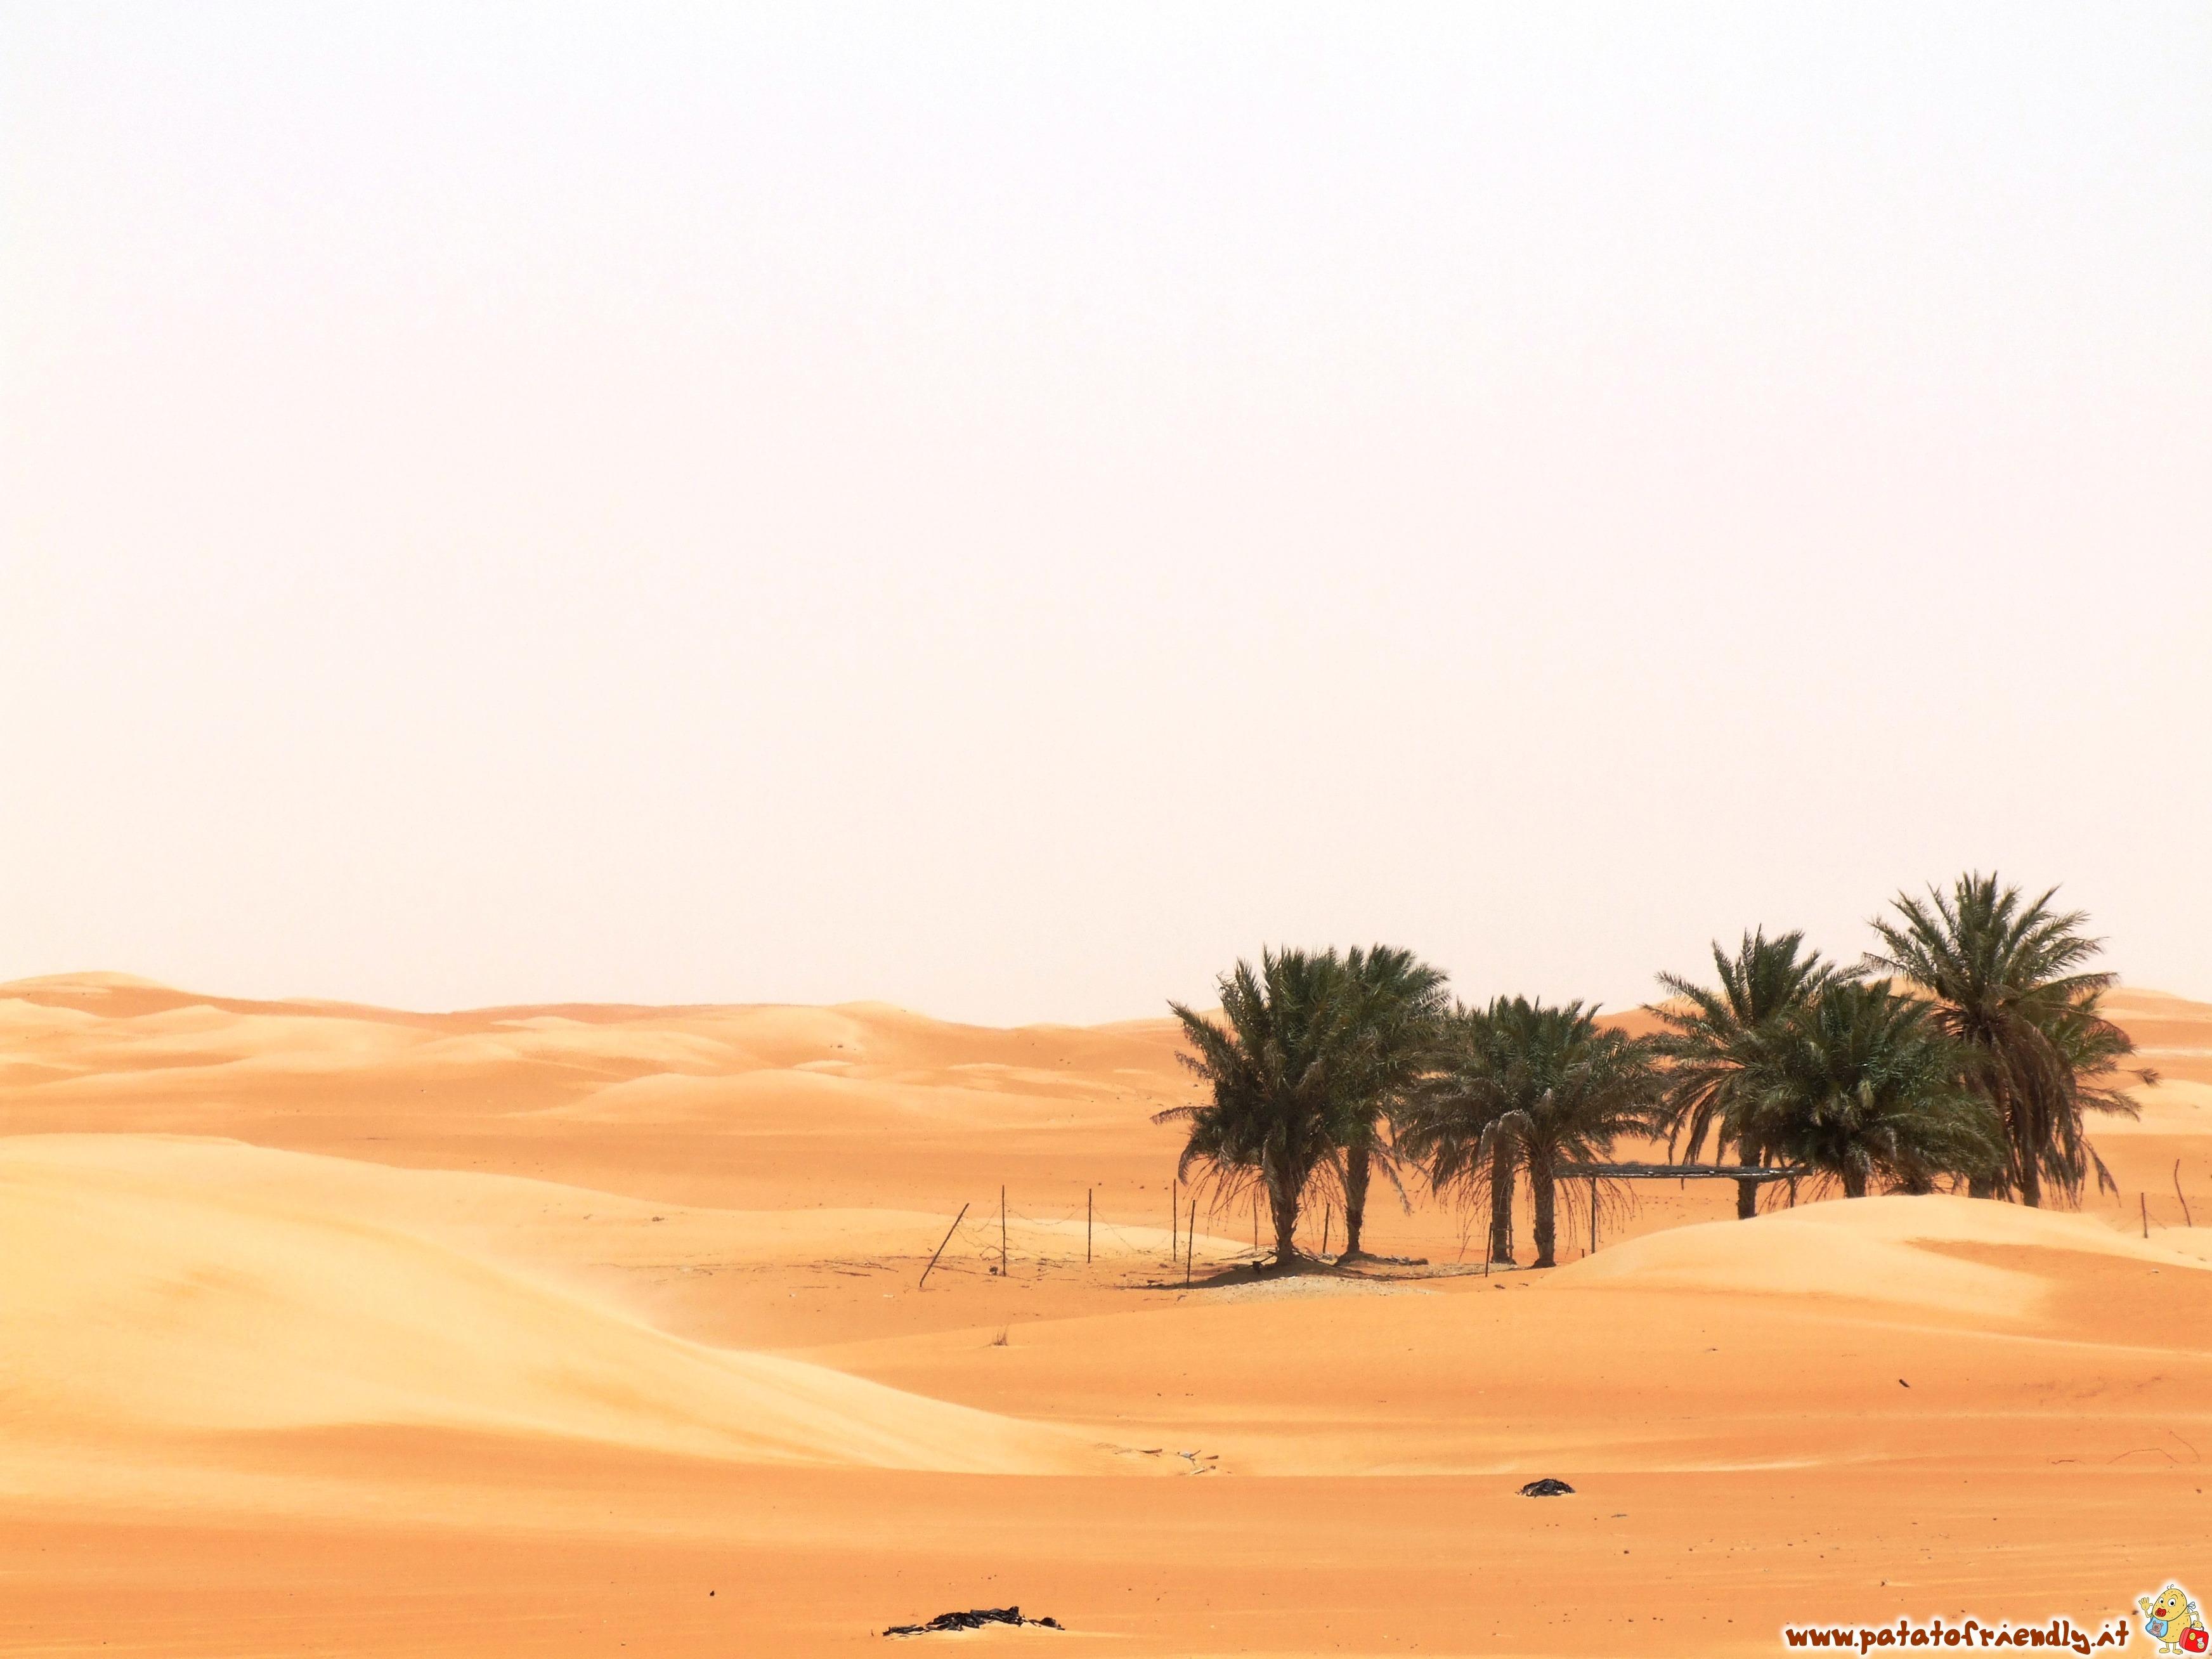 [cml_media_alt id='2794']Oasi nel deserto degli Emirati Arabi[/cml_media_alt]